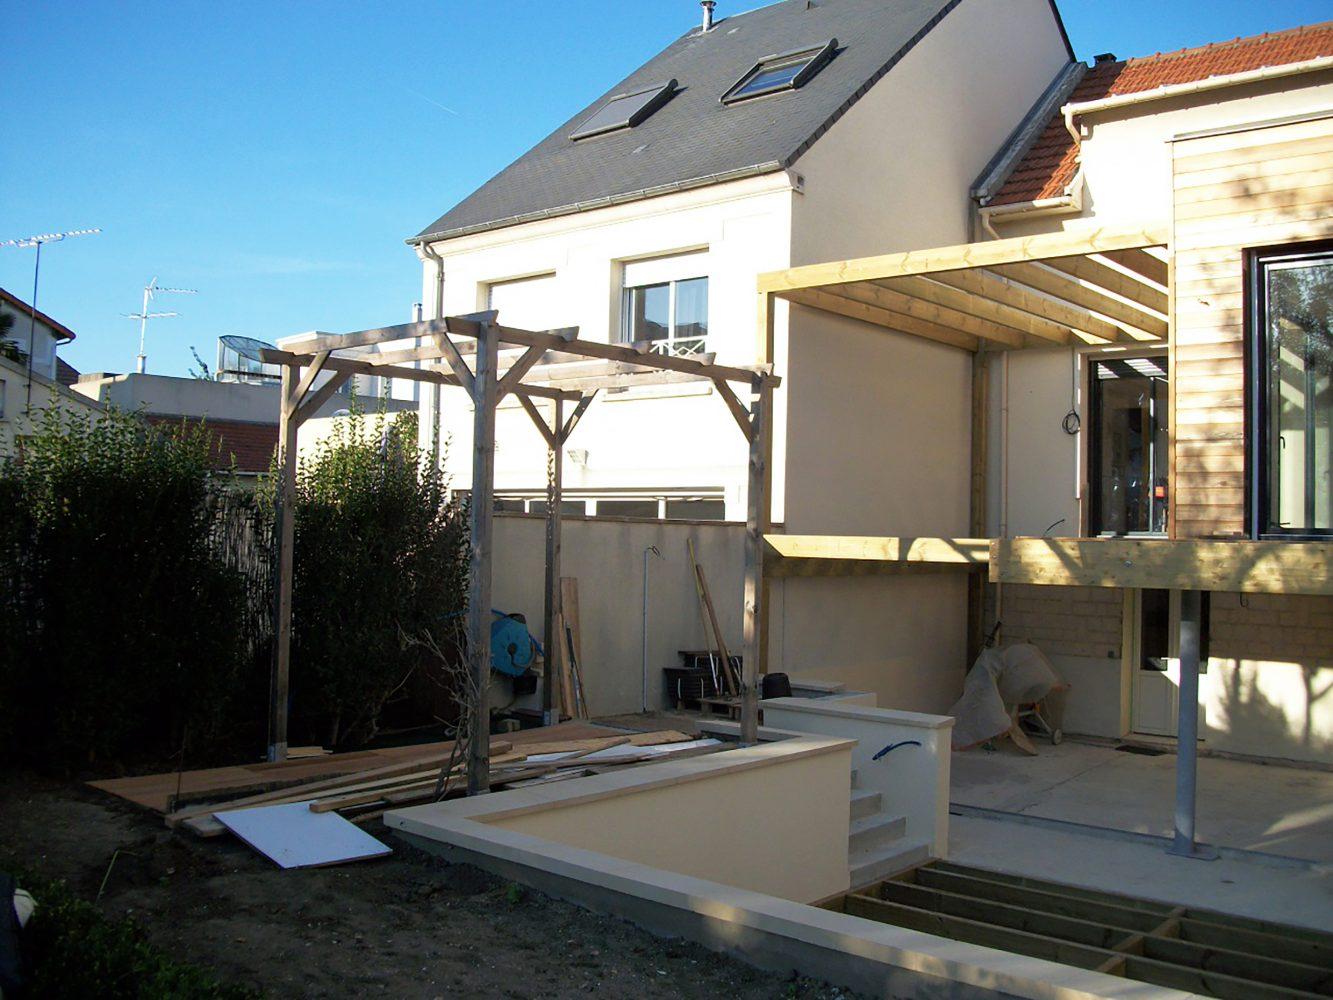 Extension ossature bois suresnes philippe zerbib for Construction extension ossature bois